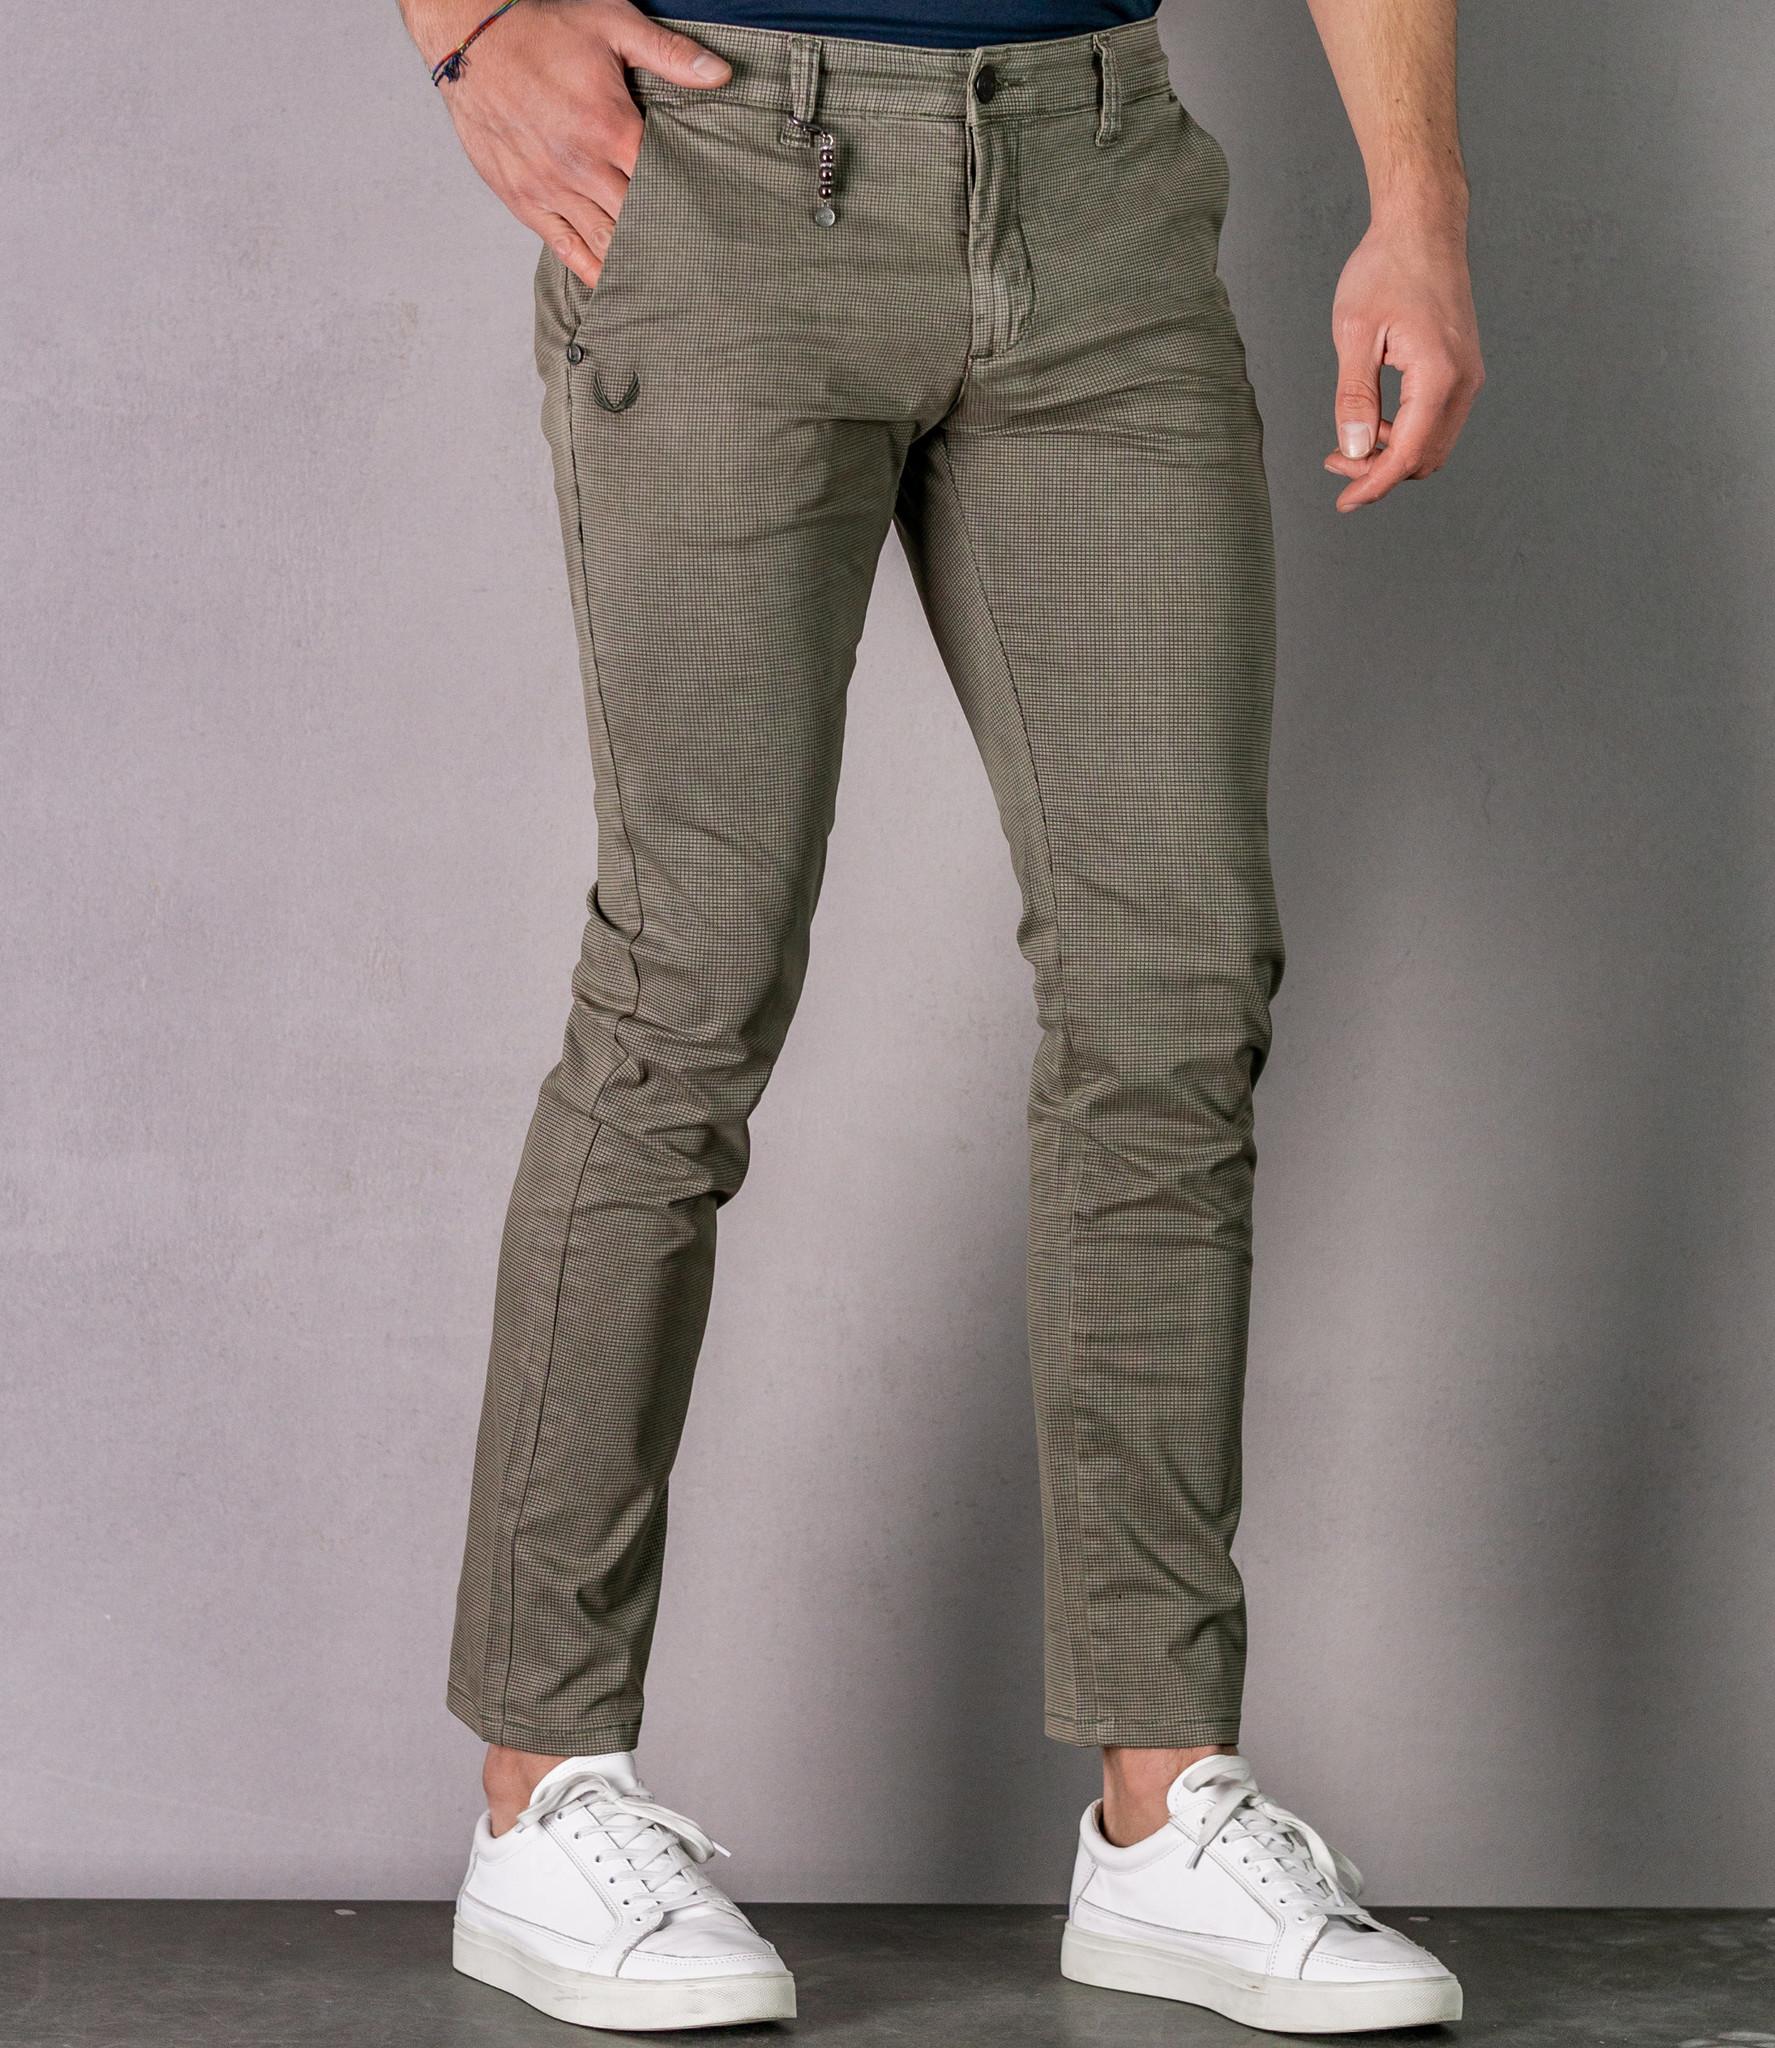 Zumo Slim Fit Pants PALM SPRINGS Screen-Check BlueKit